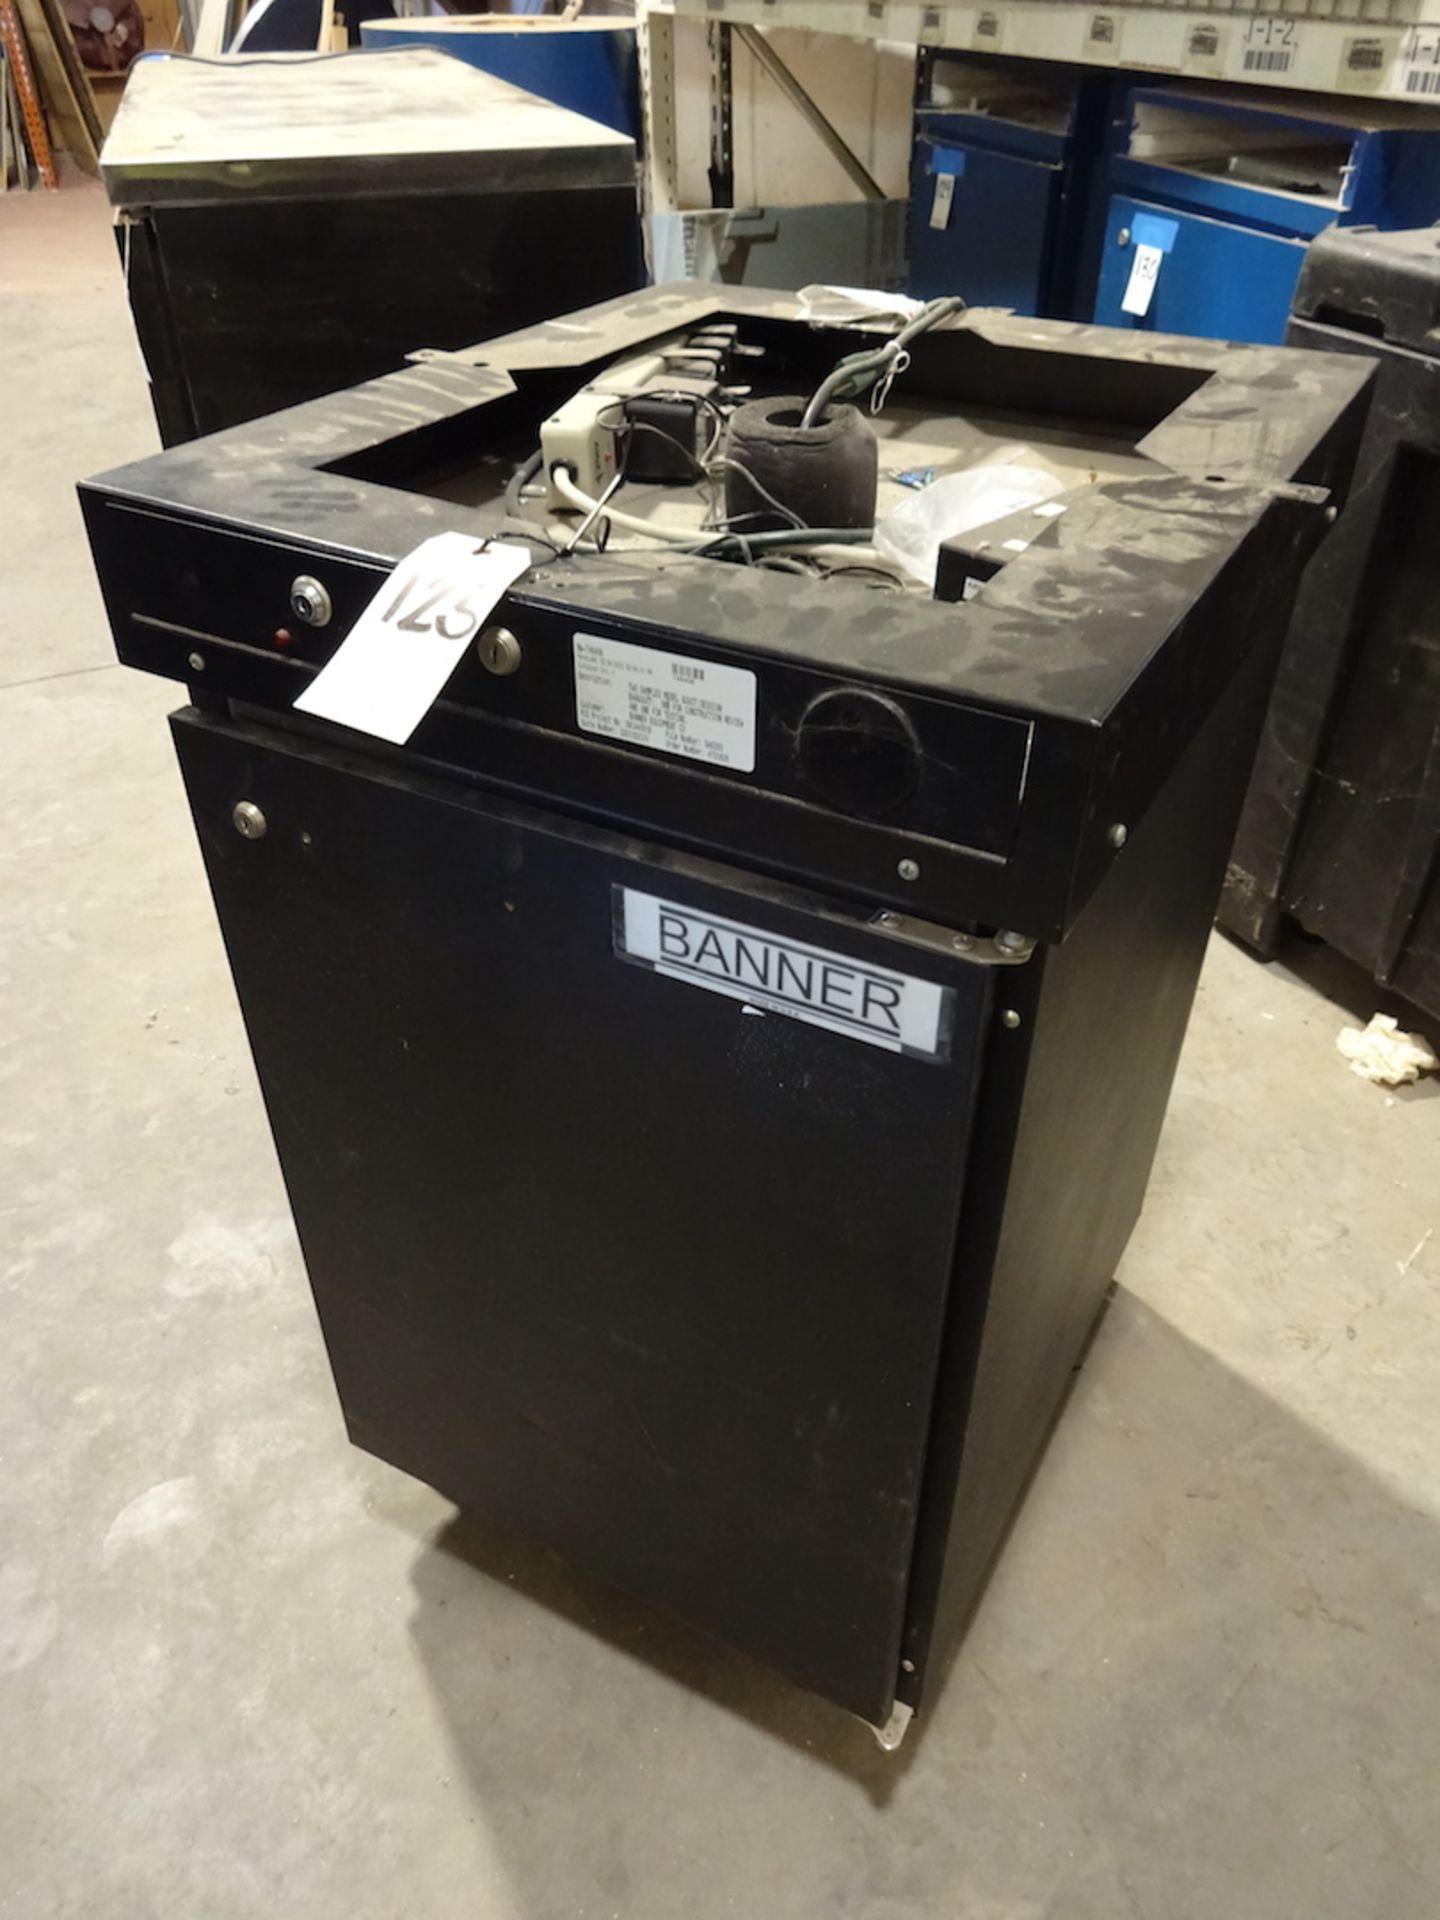 Lot 125 - Beverage Air 1/2 Barrel Beer Cooler, with Top (Kegerator)